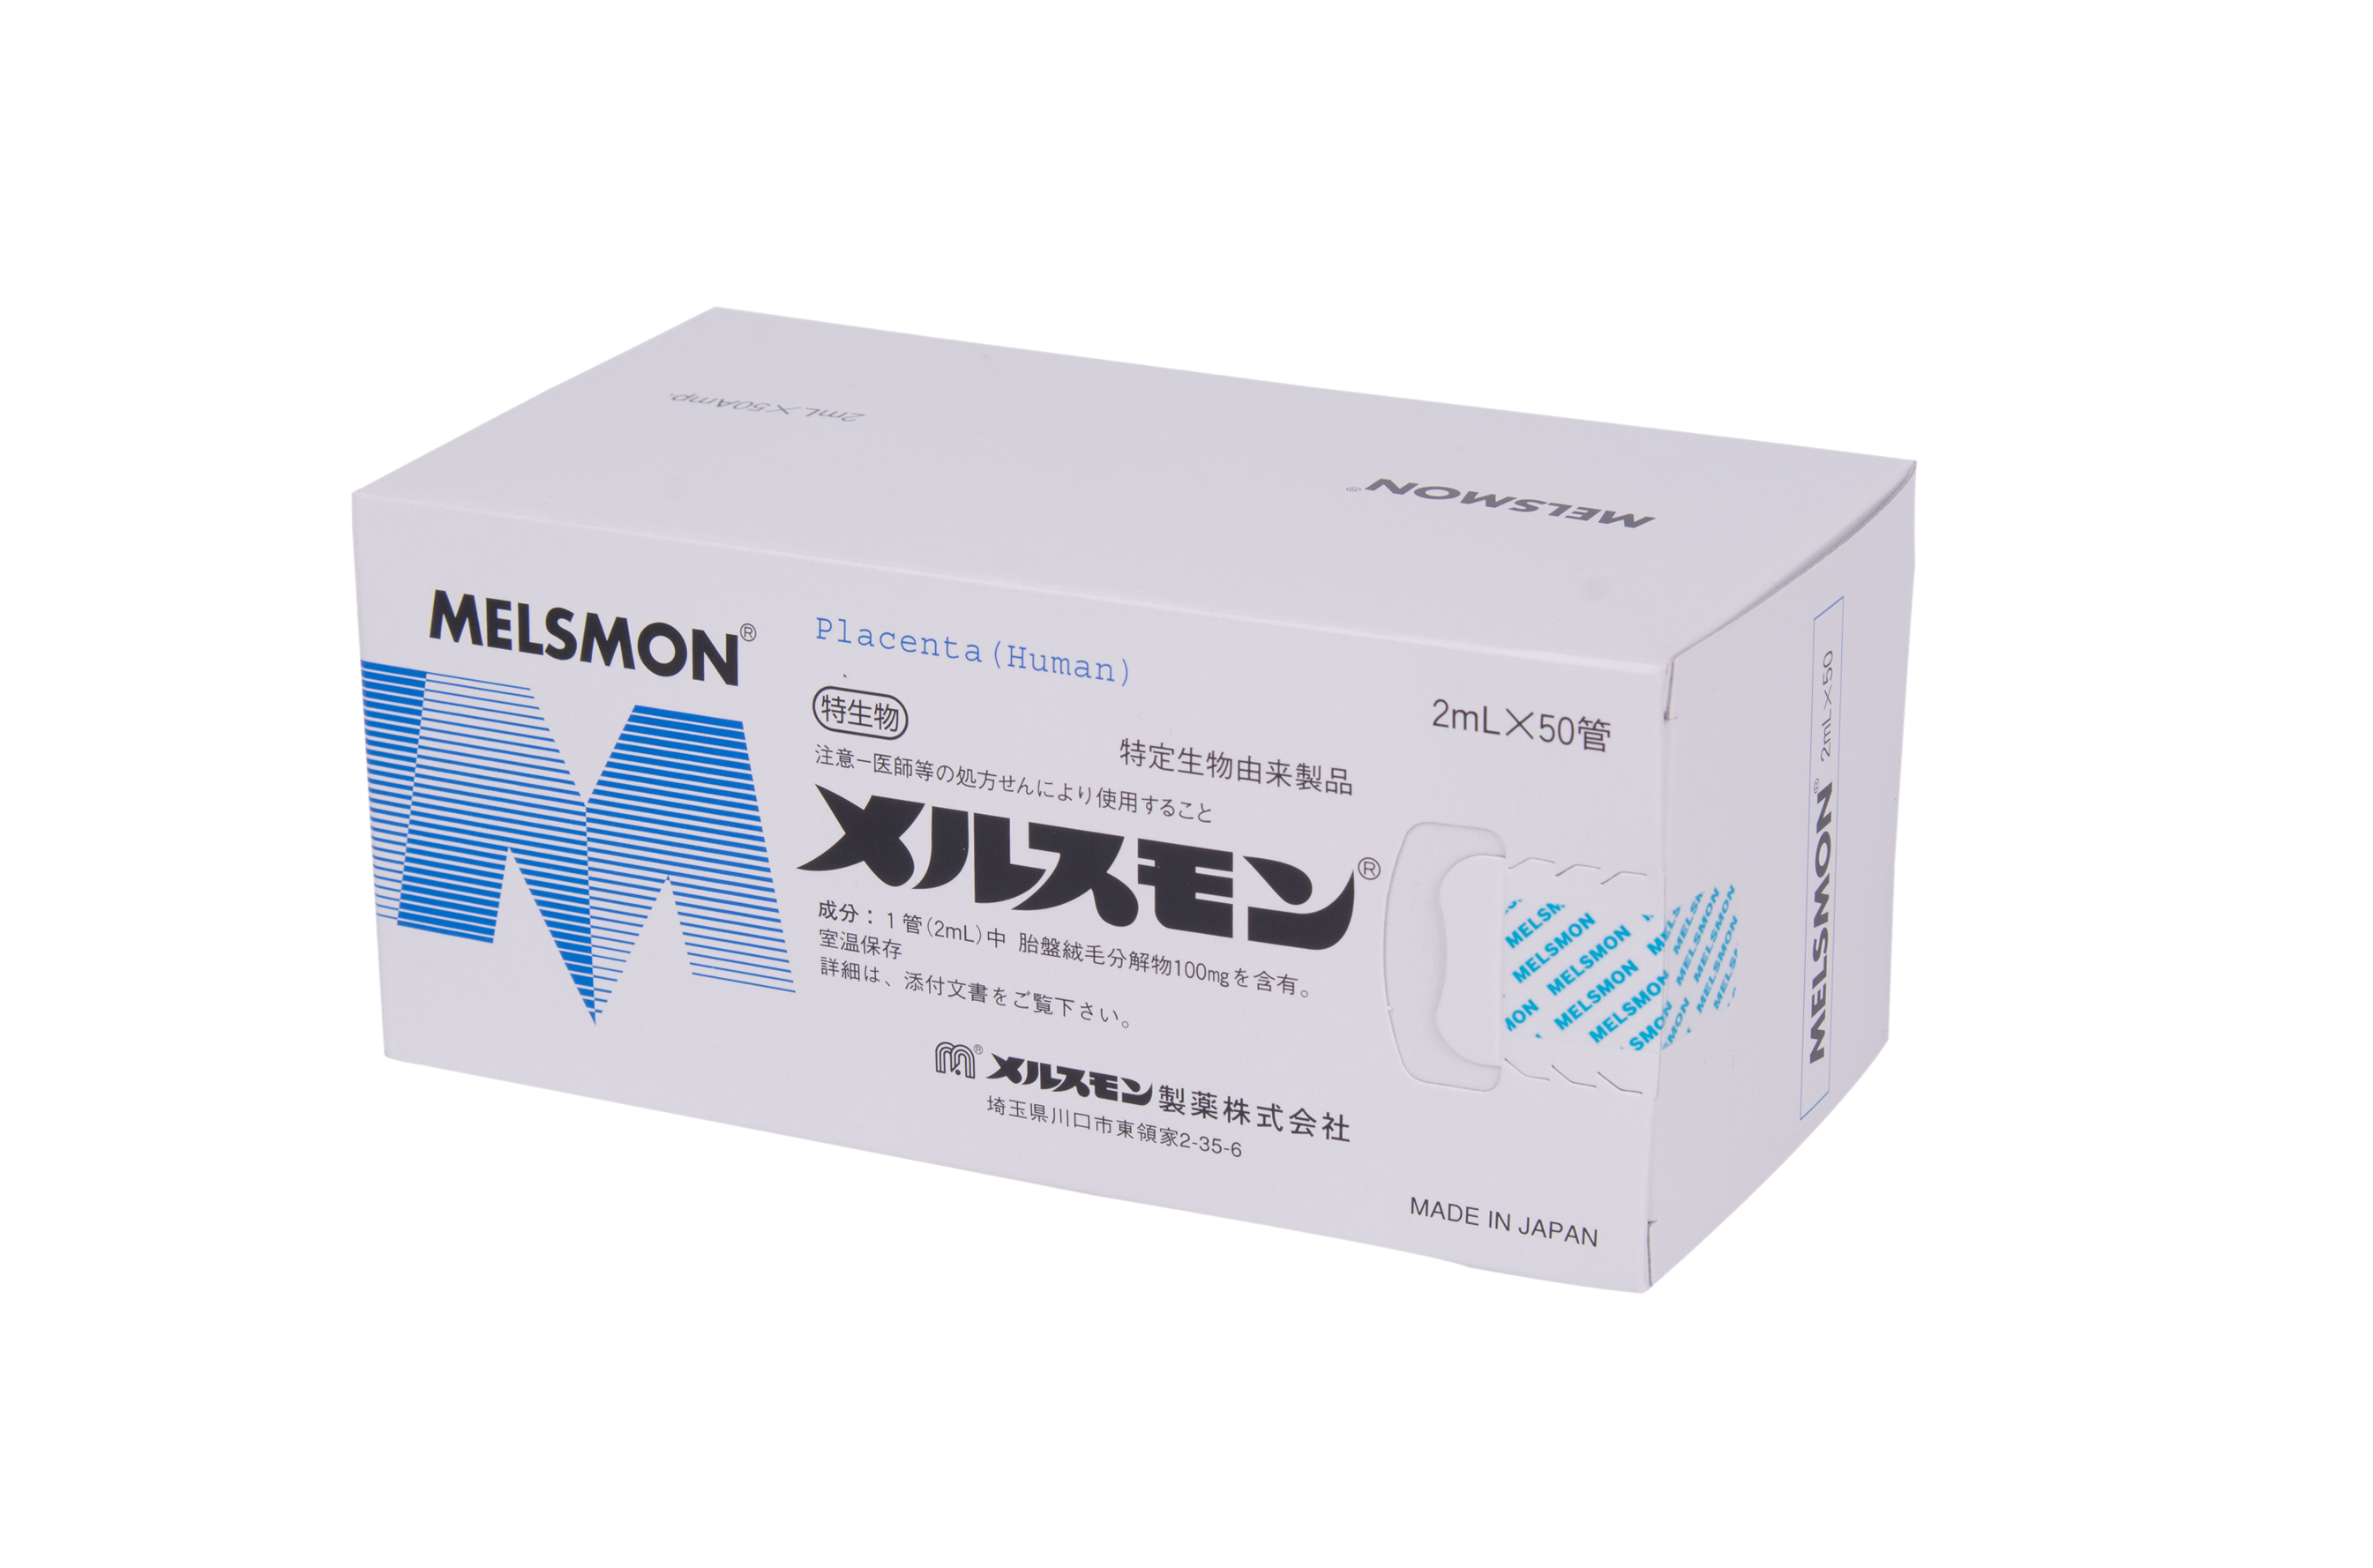 Melsmon Human Placenta Injection